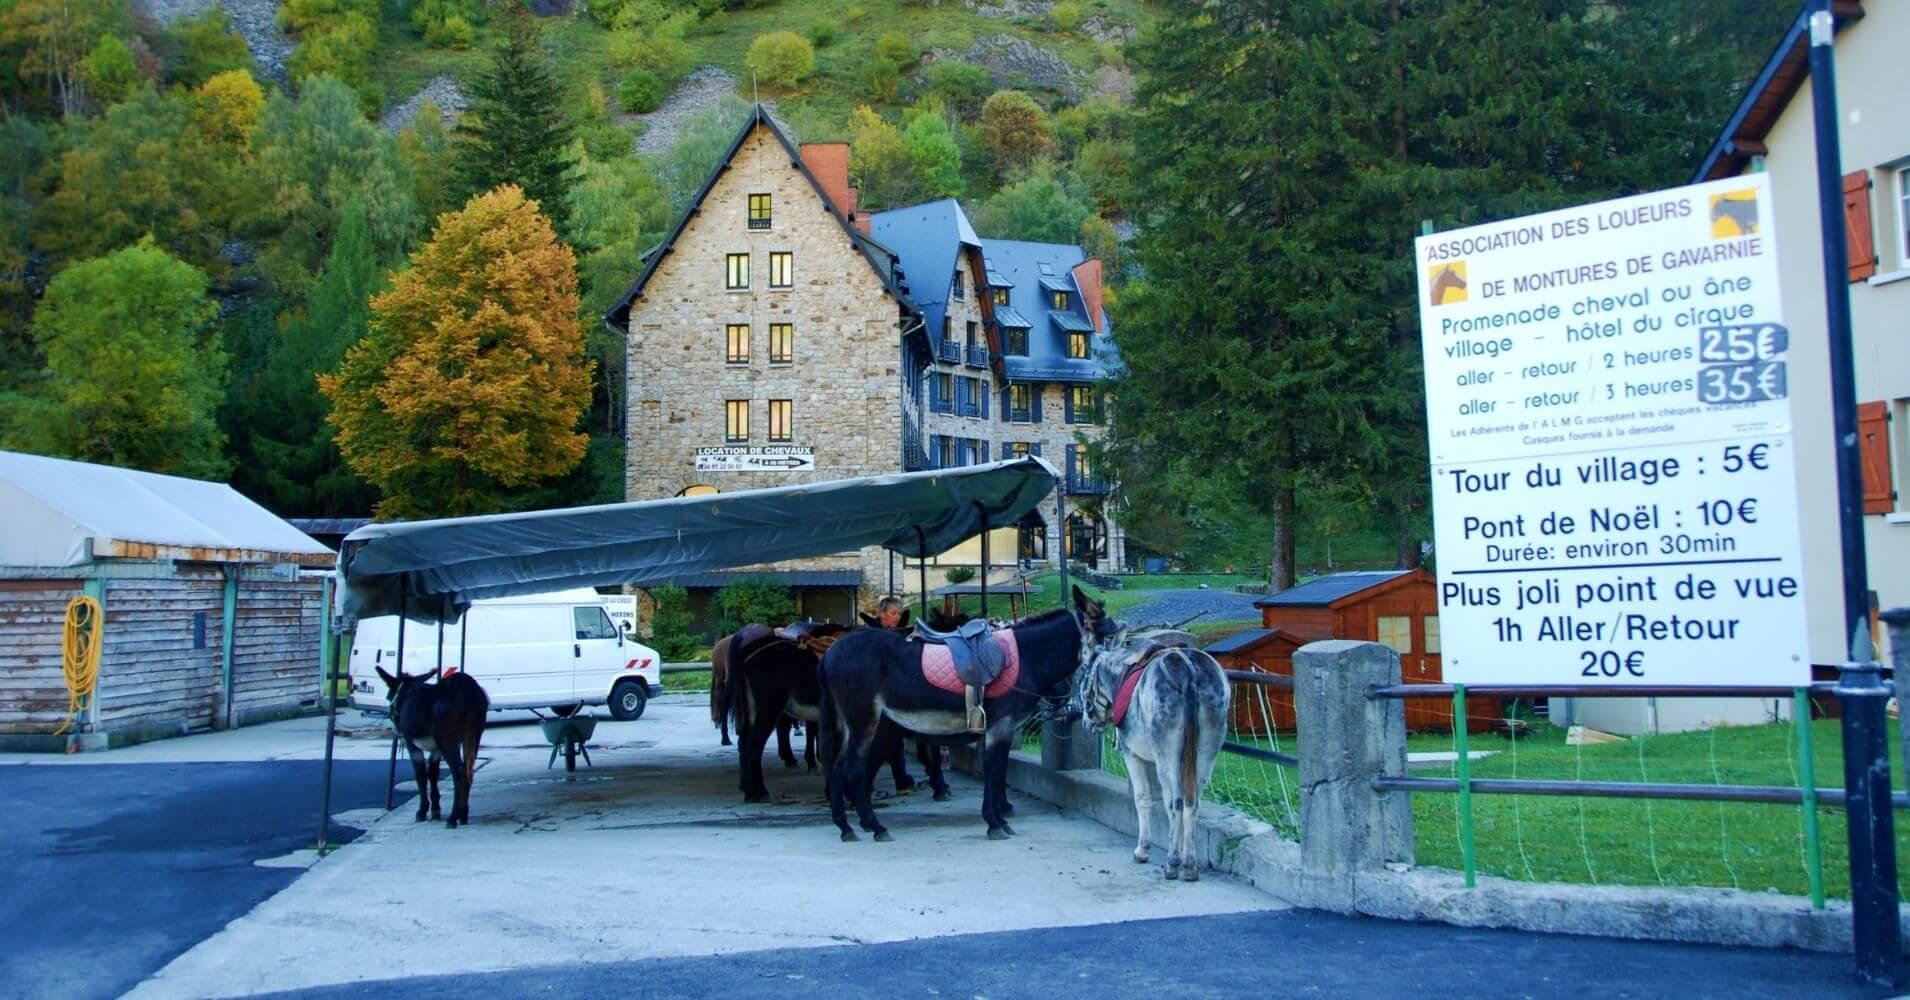 Tour en Borrico, Departamento de Altos Pirineos. Occitania. Francia.